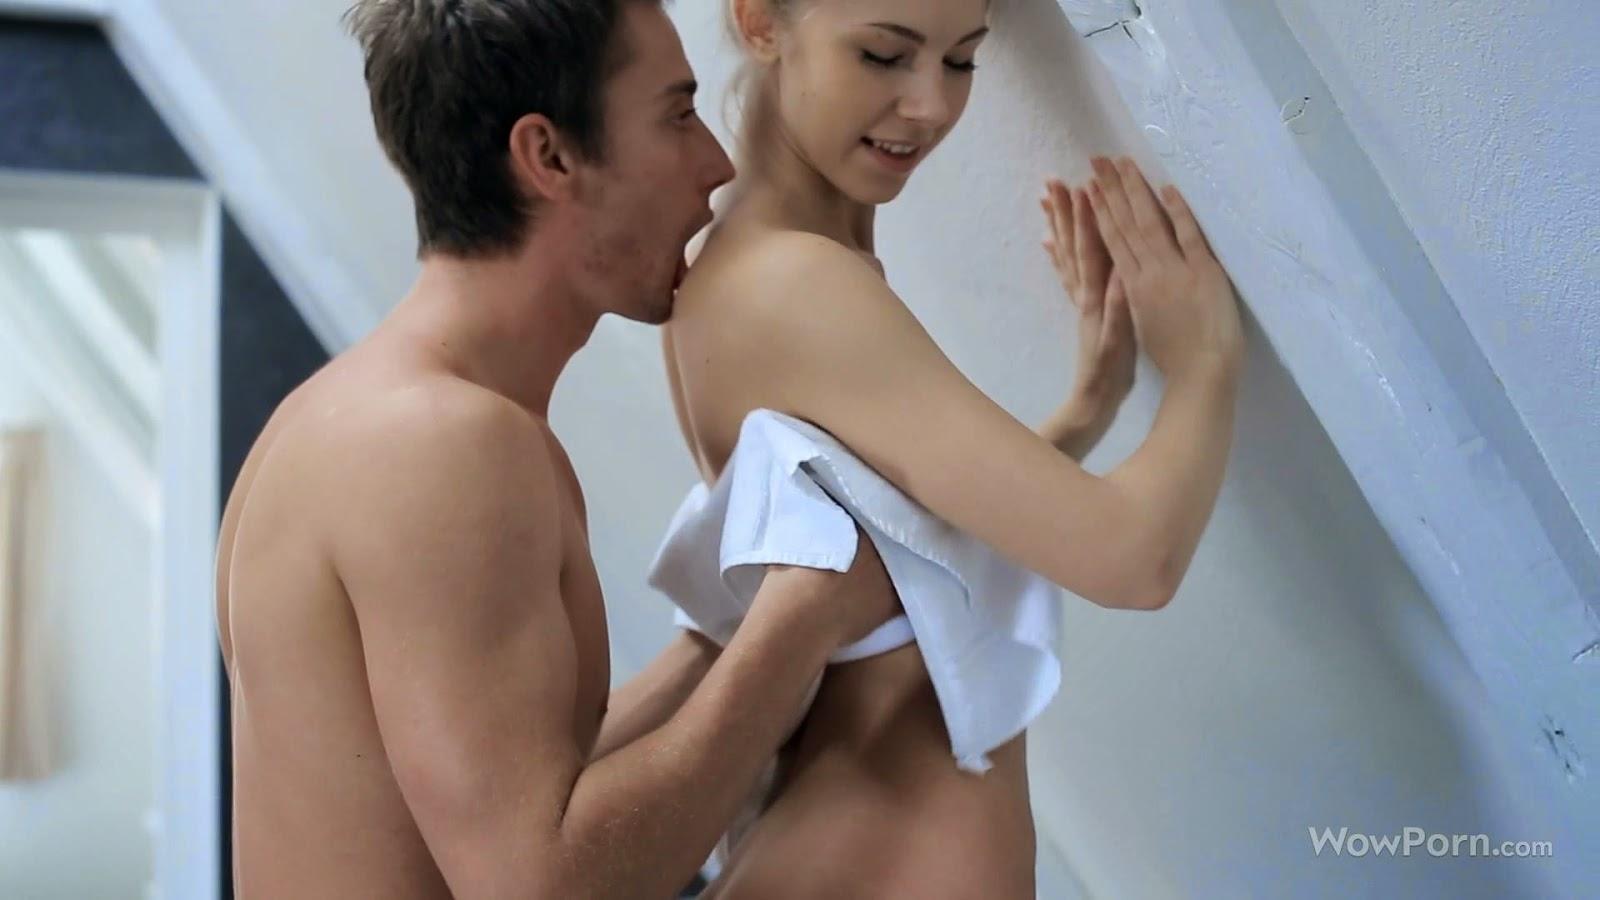 Torrent sperm semen video